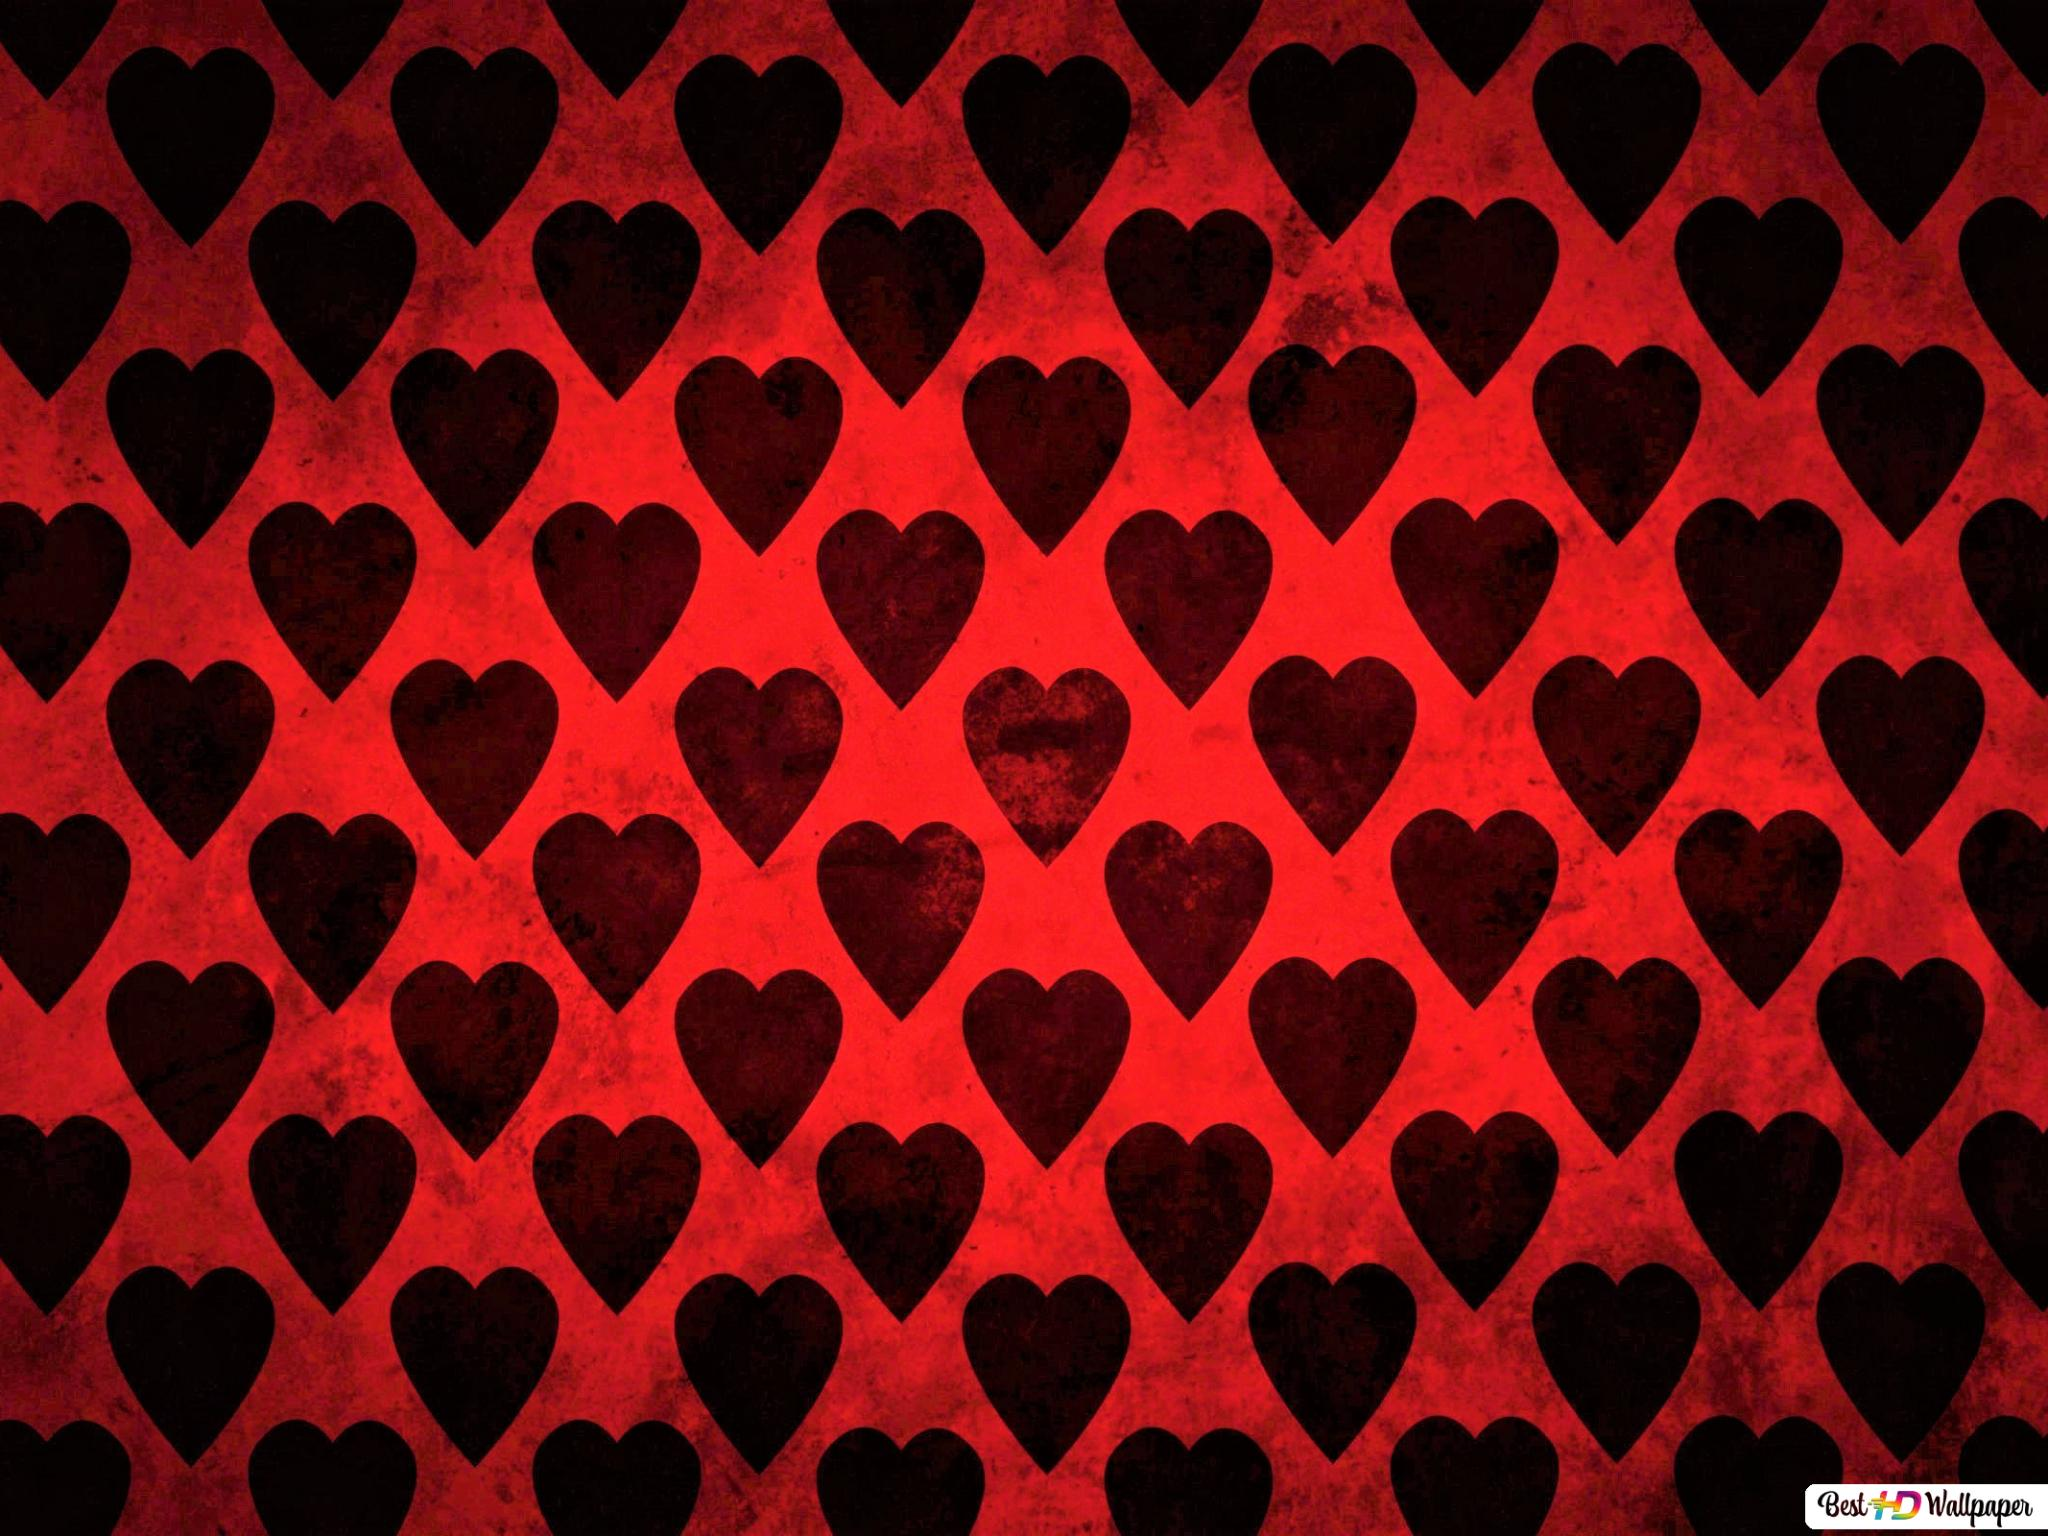 Valentine S Day Black Hearts Pattern Hd Wallpaper Download